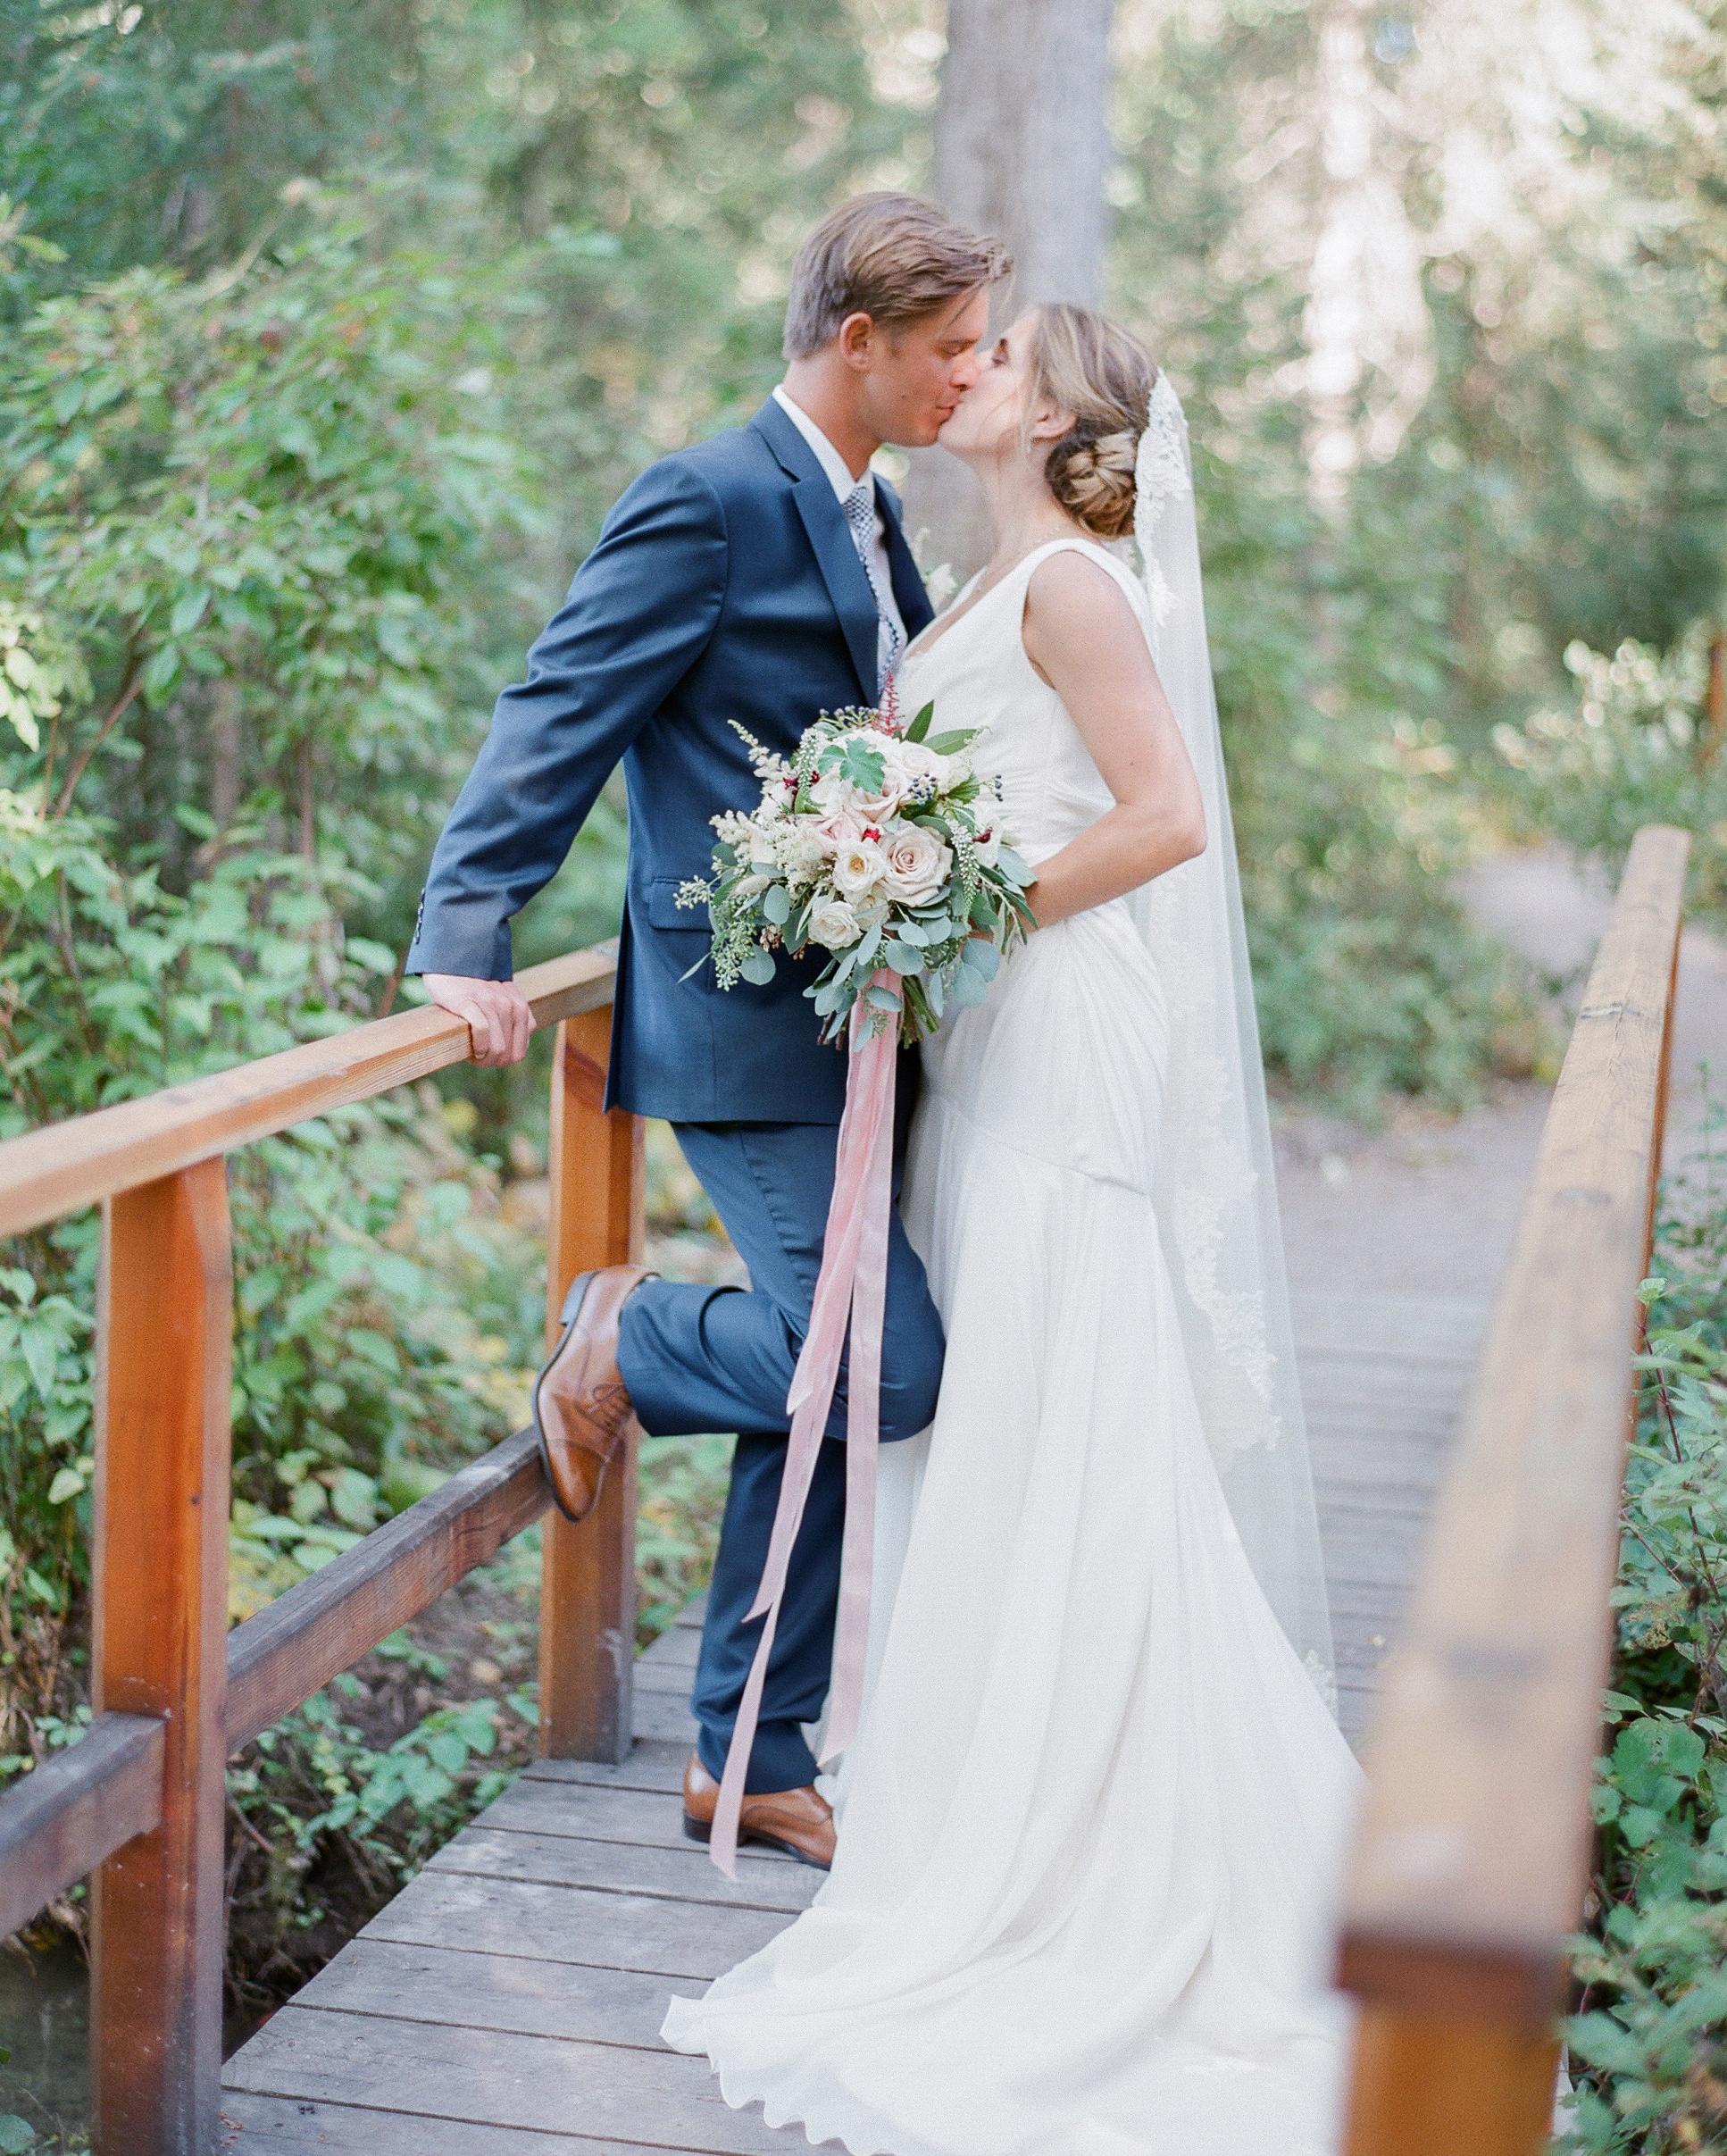 robin-kenny-wedding-couple-078-s112068-0715.jpg